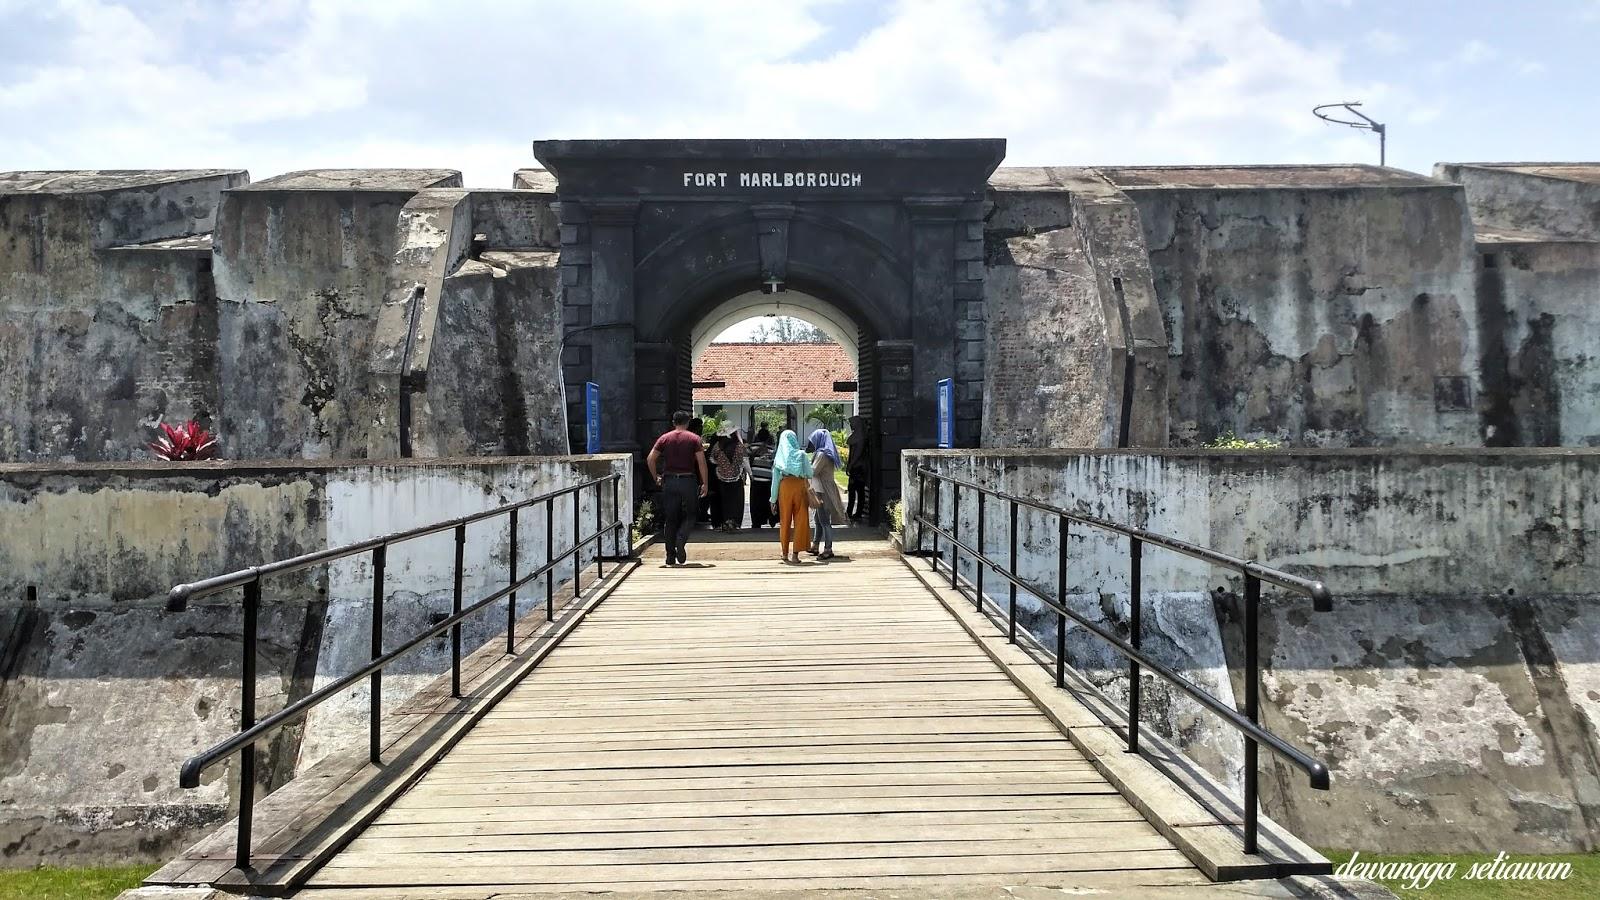 Wisata Sejarah Benteng Fort Marlborough Bengkulu Dewangga Setiawan Gerbang Masuk